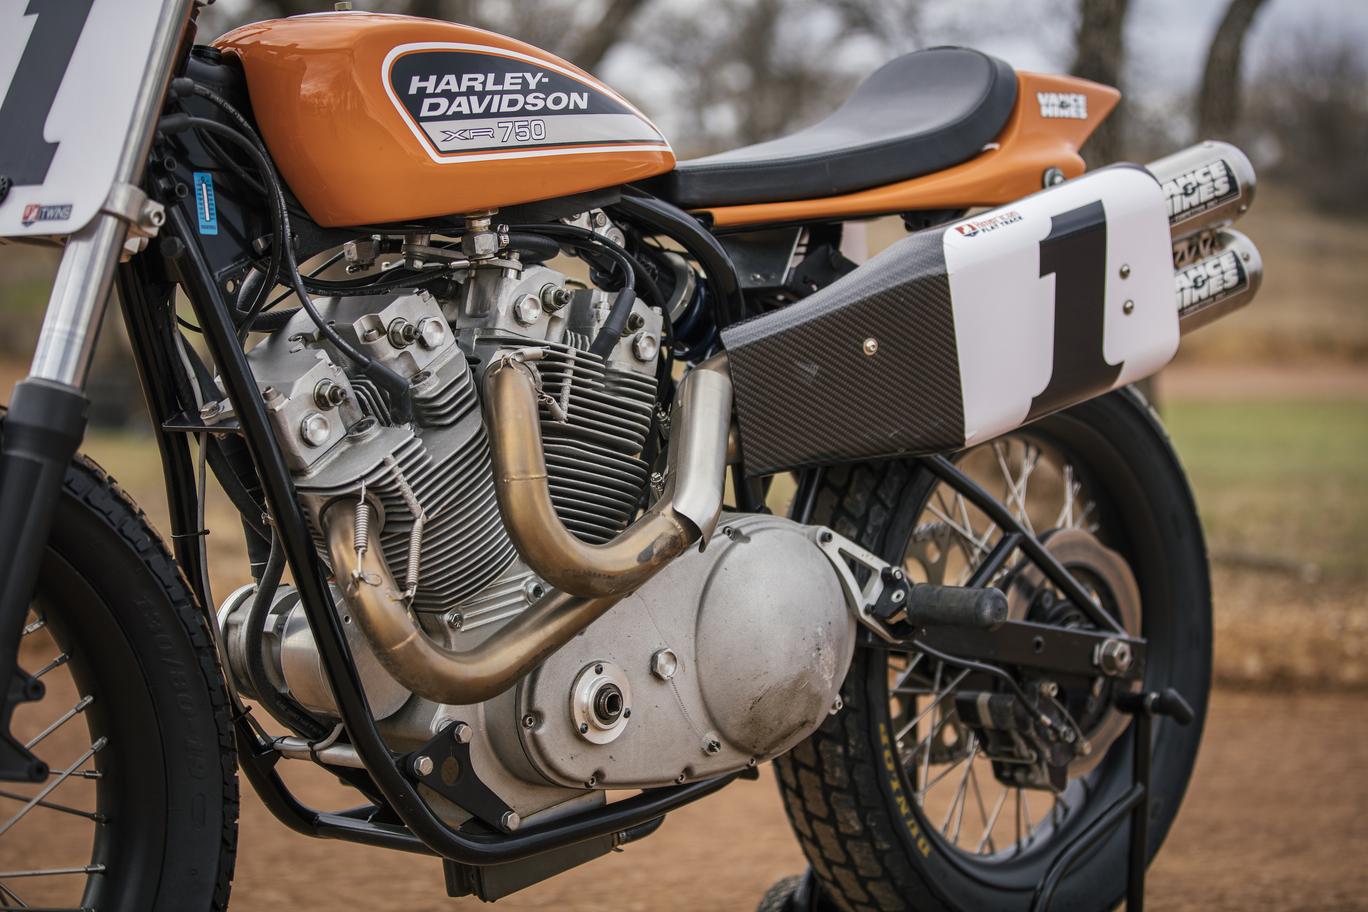 Iconic Harley-Davidson Motorcycles